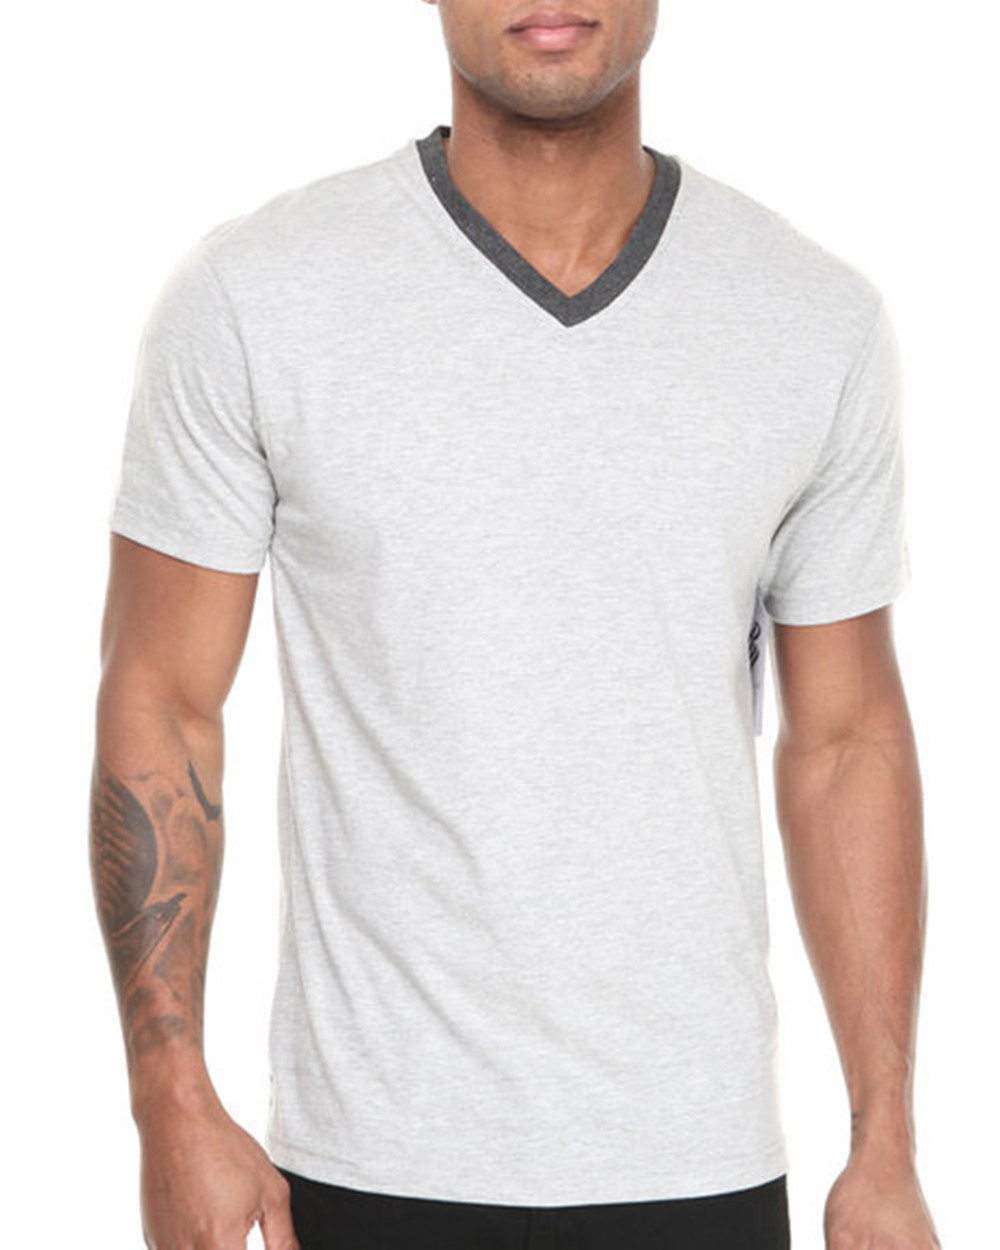 Design shirt v neck - Men V Neck Plain T Shirt Design Buy Mens V Neck T Shirts T Shirt Design Plain T Shirts Product On Alibaba Com